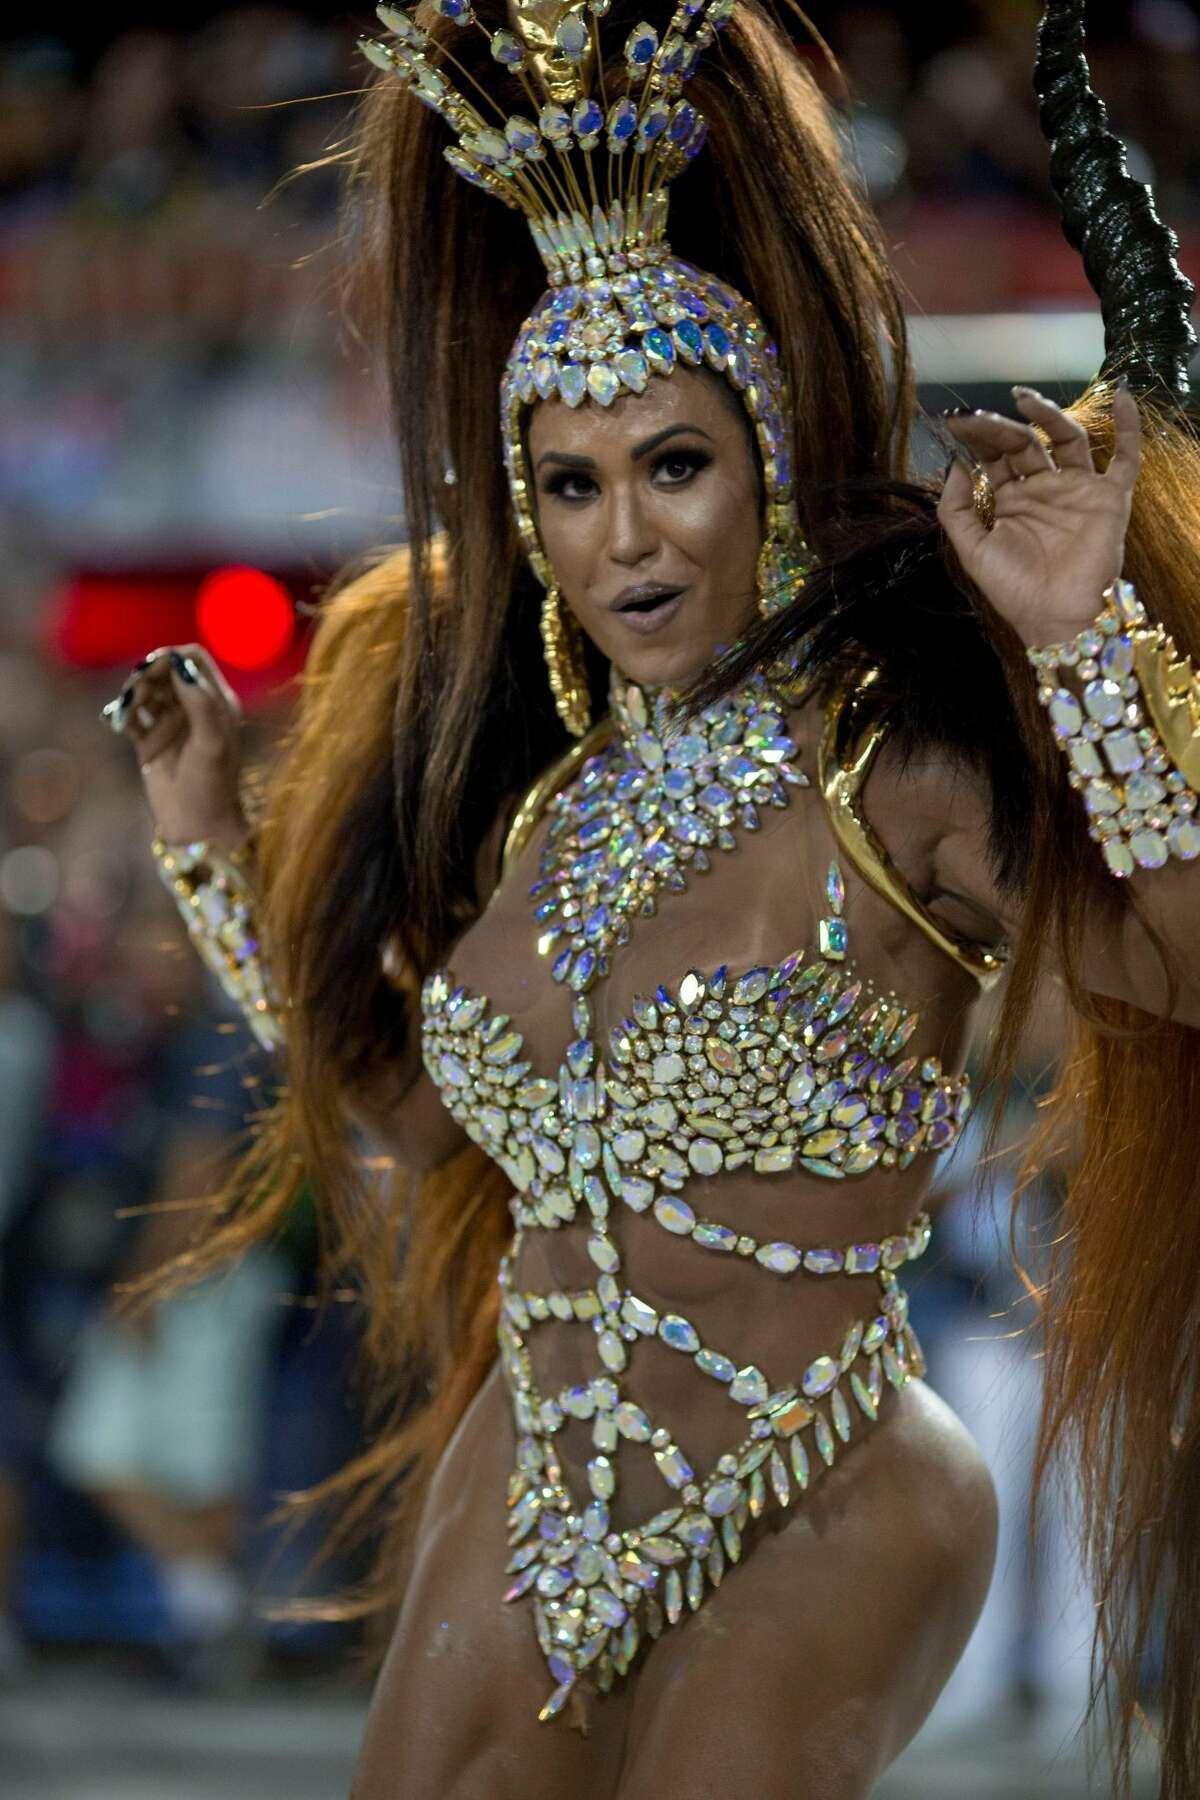 A reveler of the Uniao da Ilha samba school performs during the second night of Rio's Carnival at the Sambadrome in Rio de Janeiro, Brazil, on February 13, 2018.